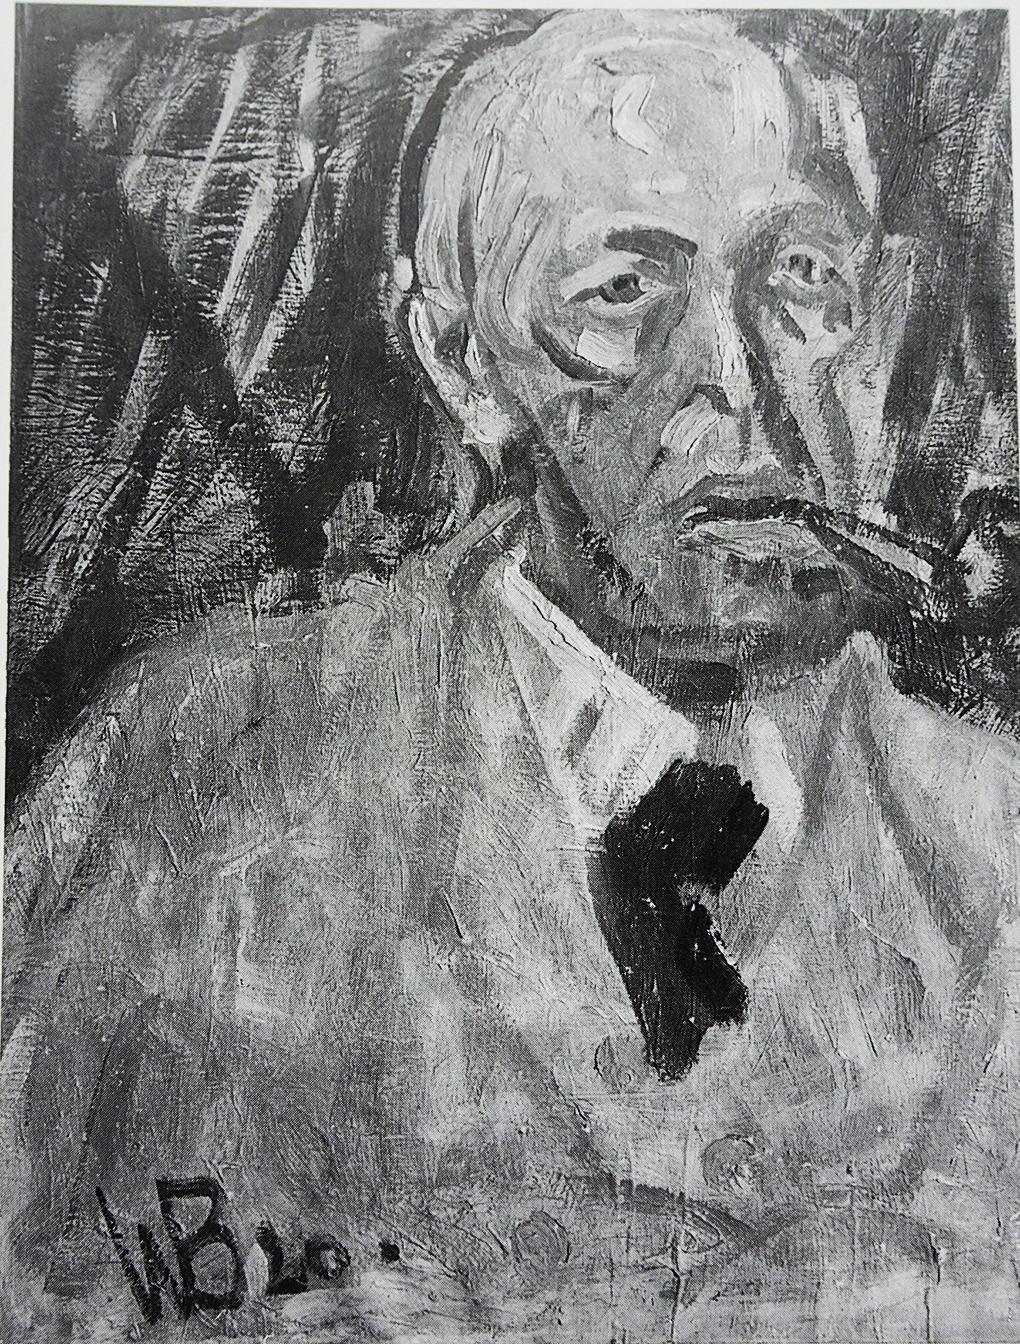 Wilhelm Bormes, Portret Paula Holza, olej na płótnie, 1920, reprodukcja w: Angelika Förster, Paul Holz Zeichner, Rostock 1998, s. 35.